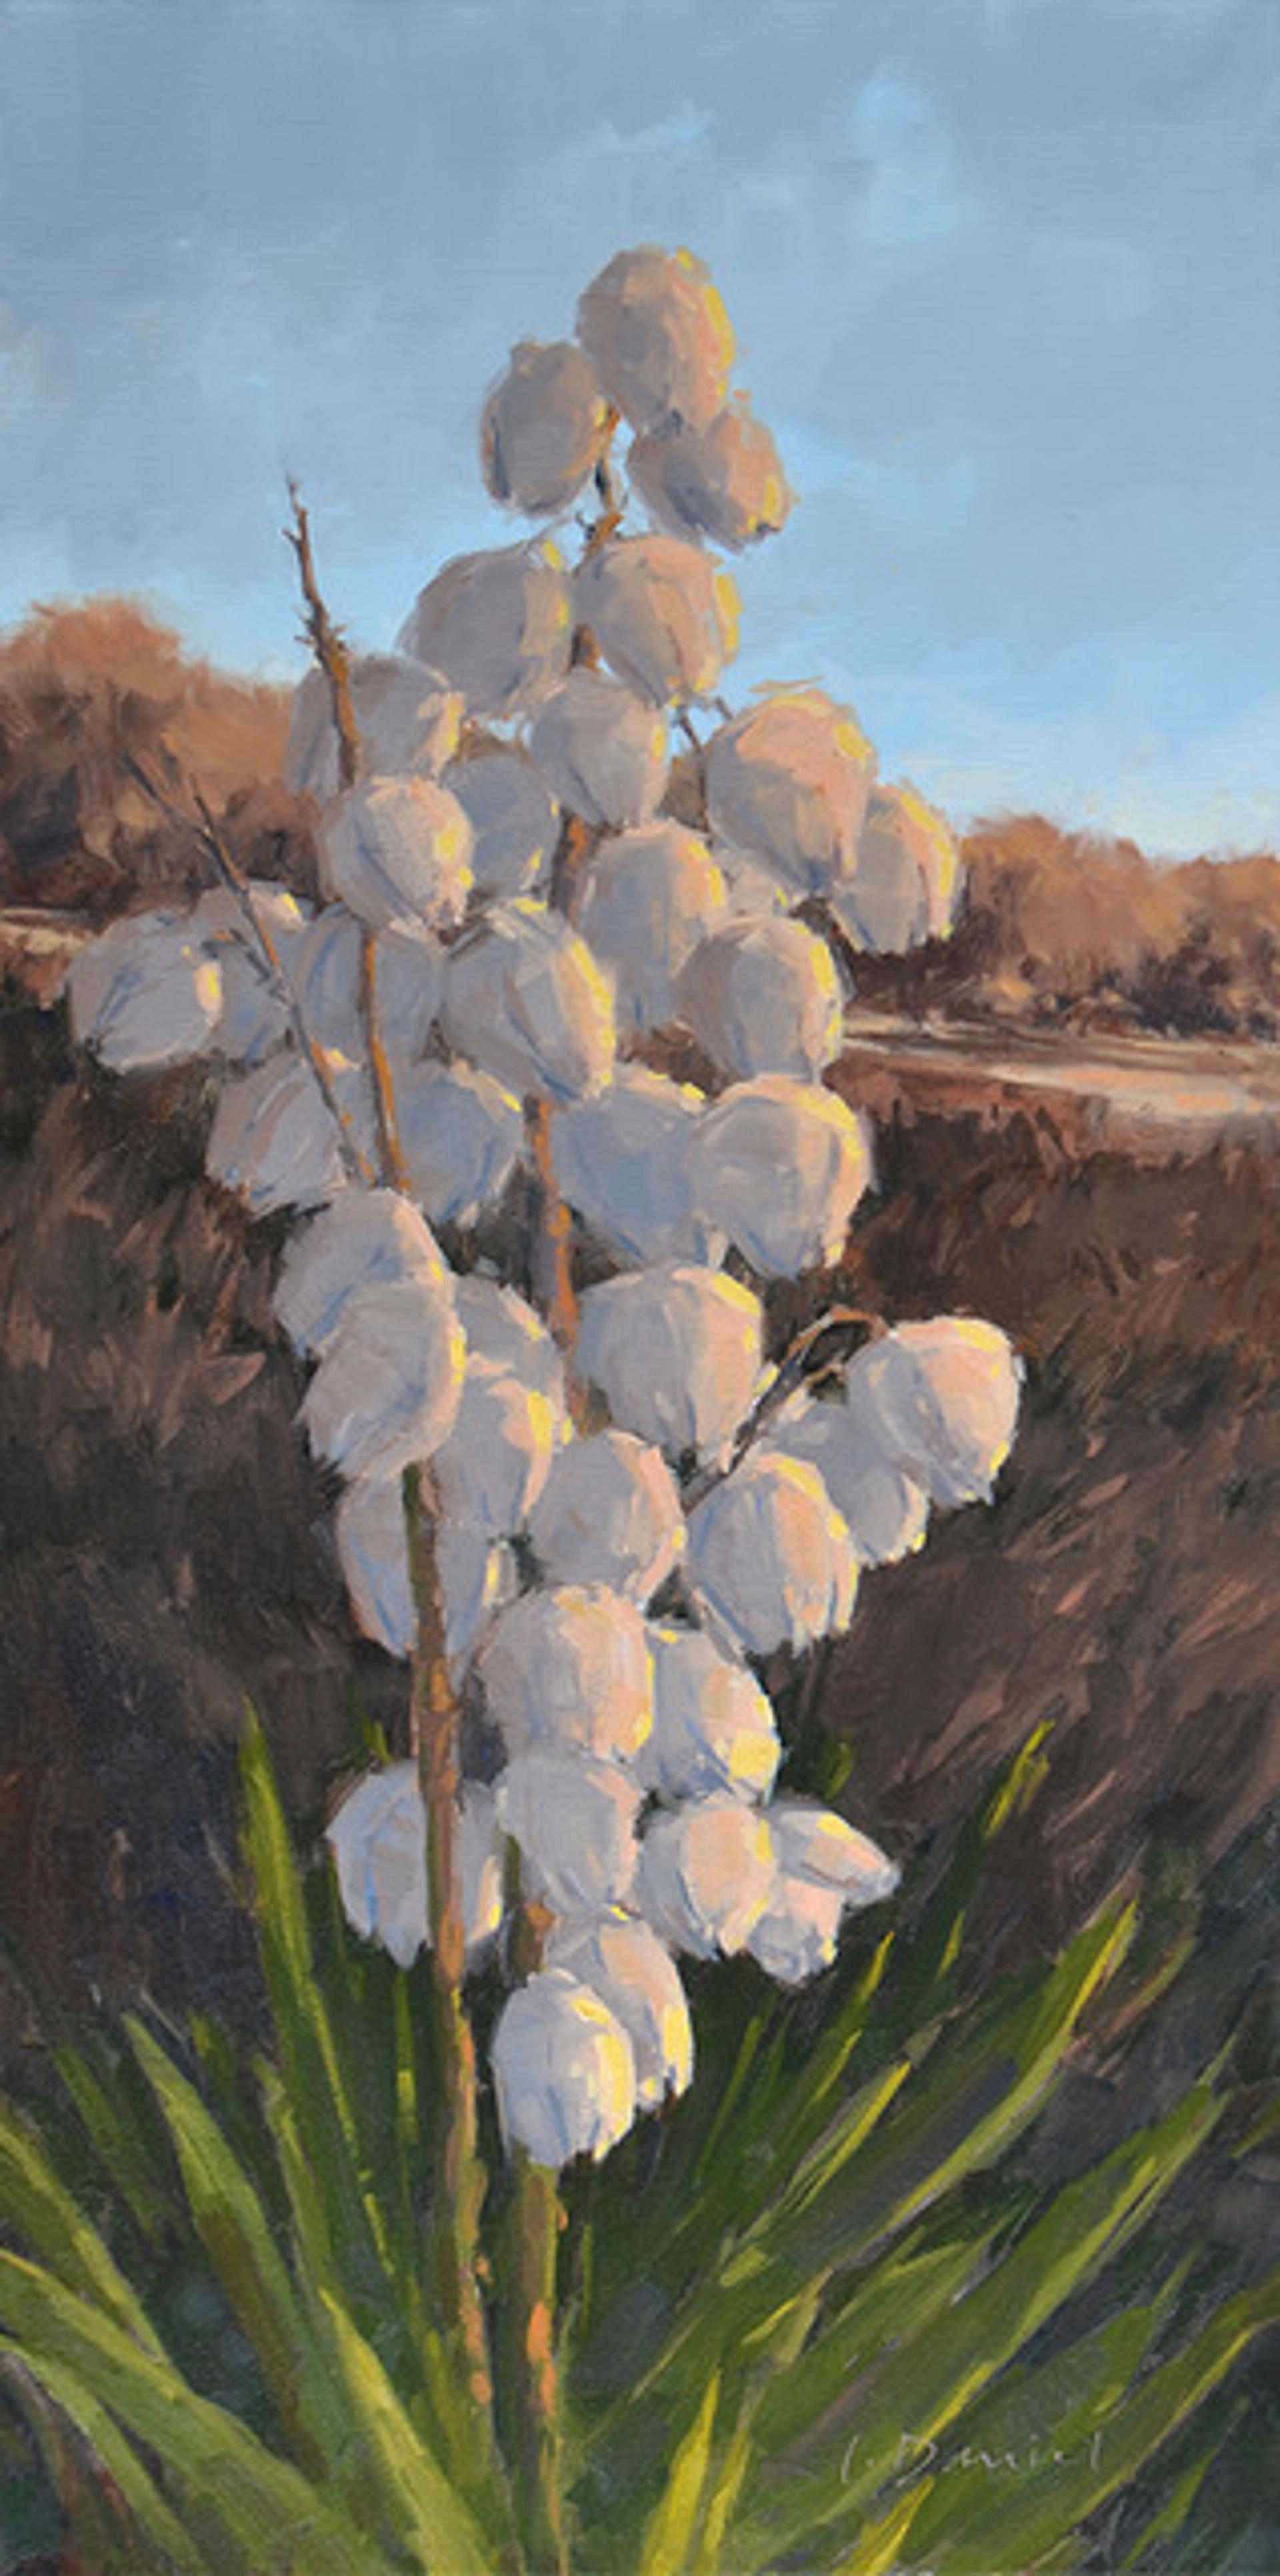 Seaside Blossoms by LAUREL DANIEL